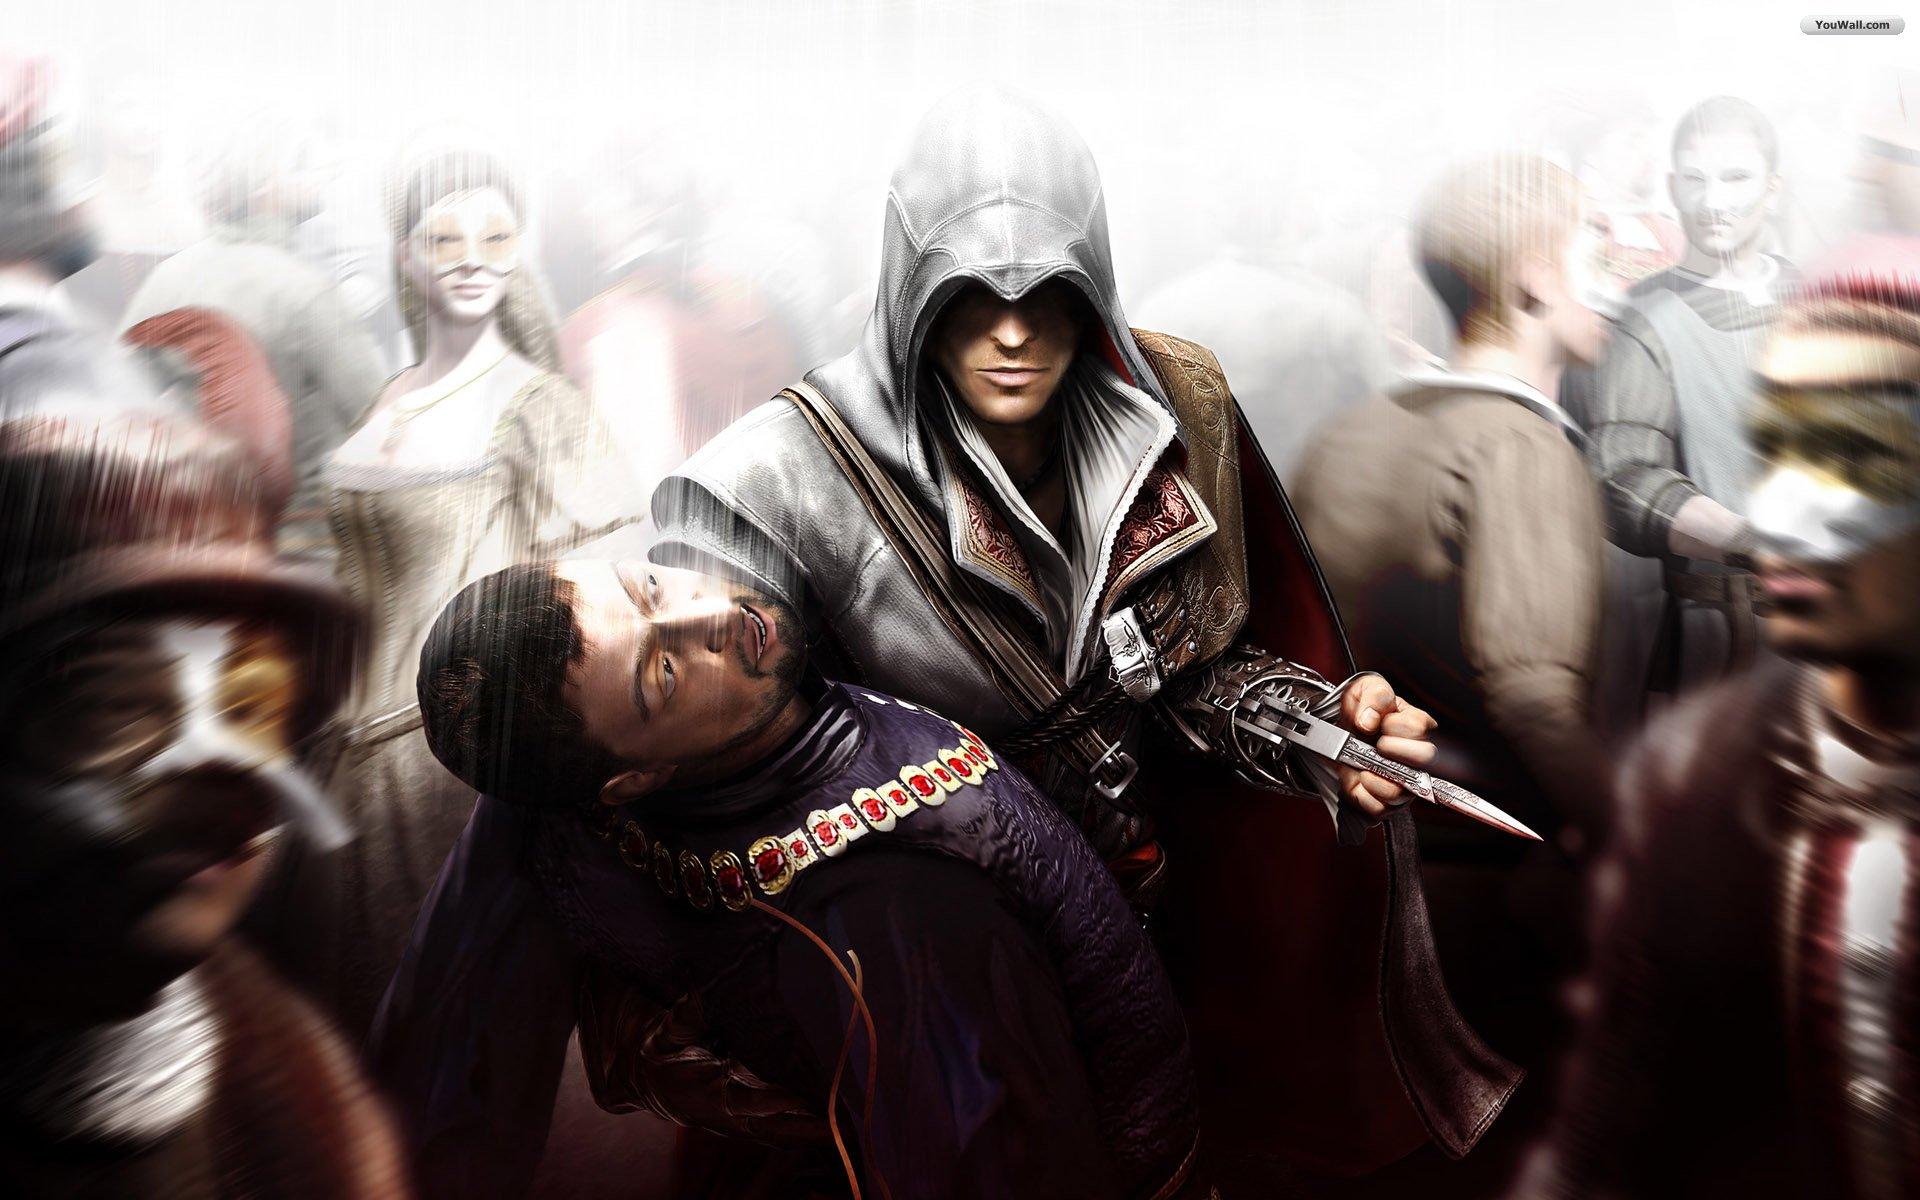 image - assassins creed brotherhood wallpaper 3c844 | assassin's